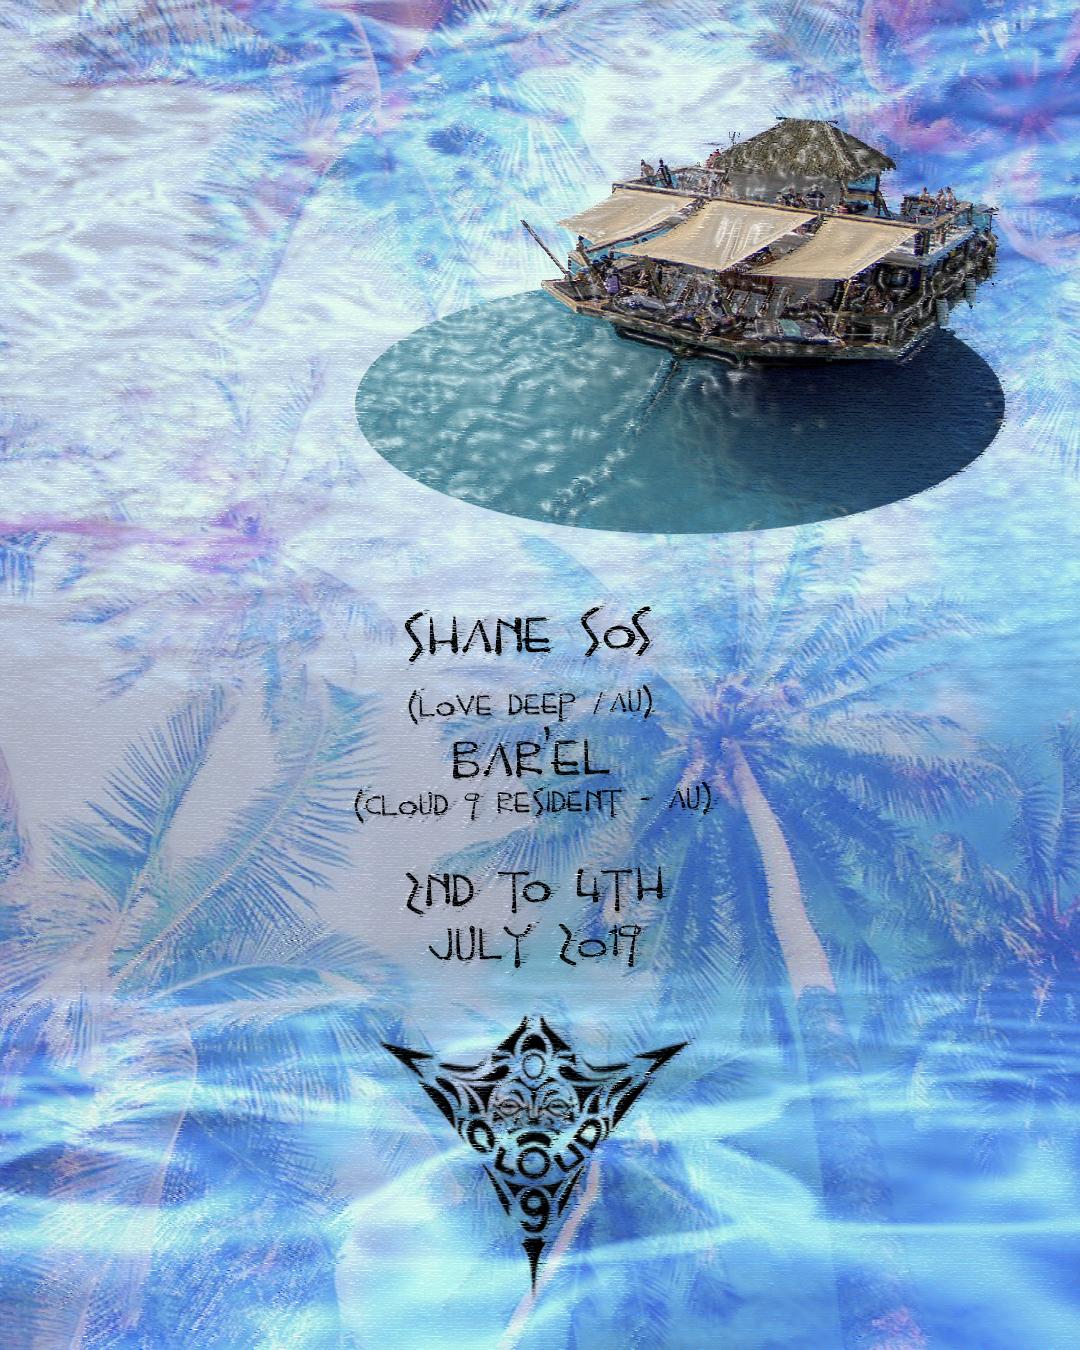 Events - Cloud9 Fiji